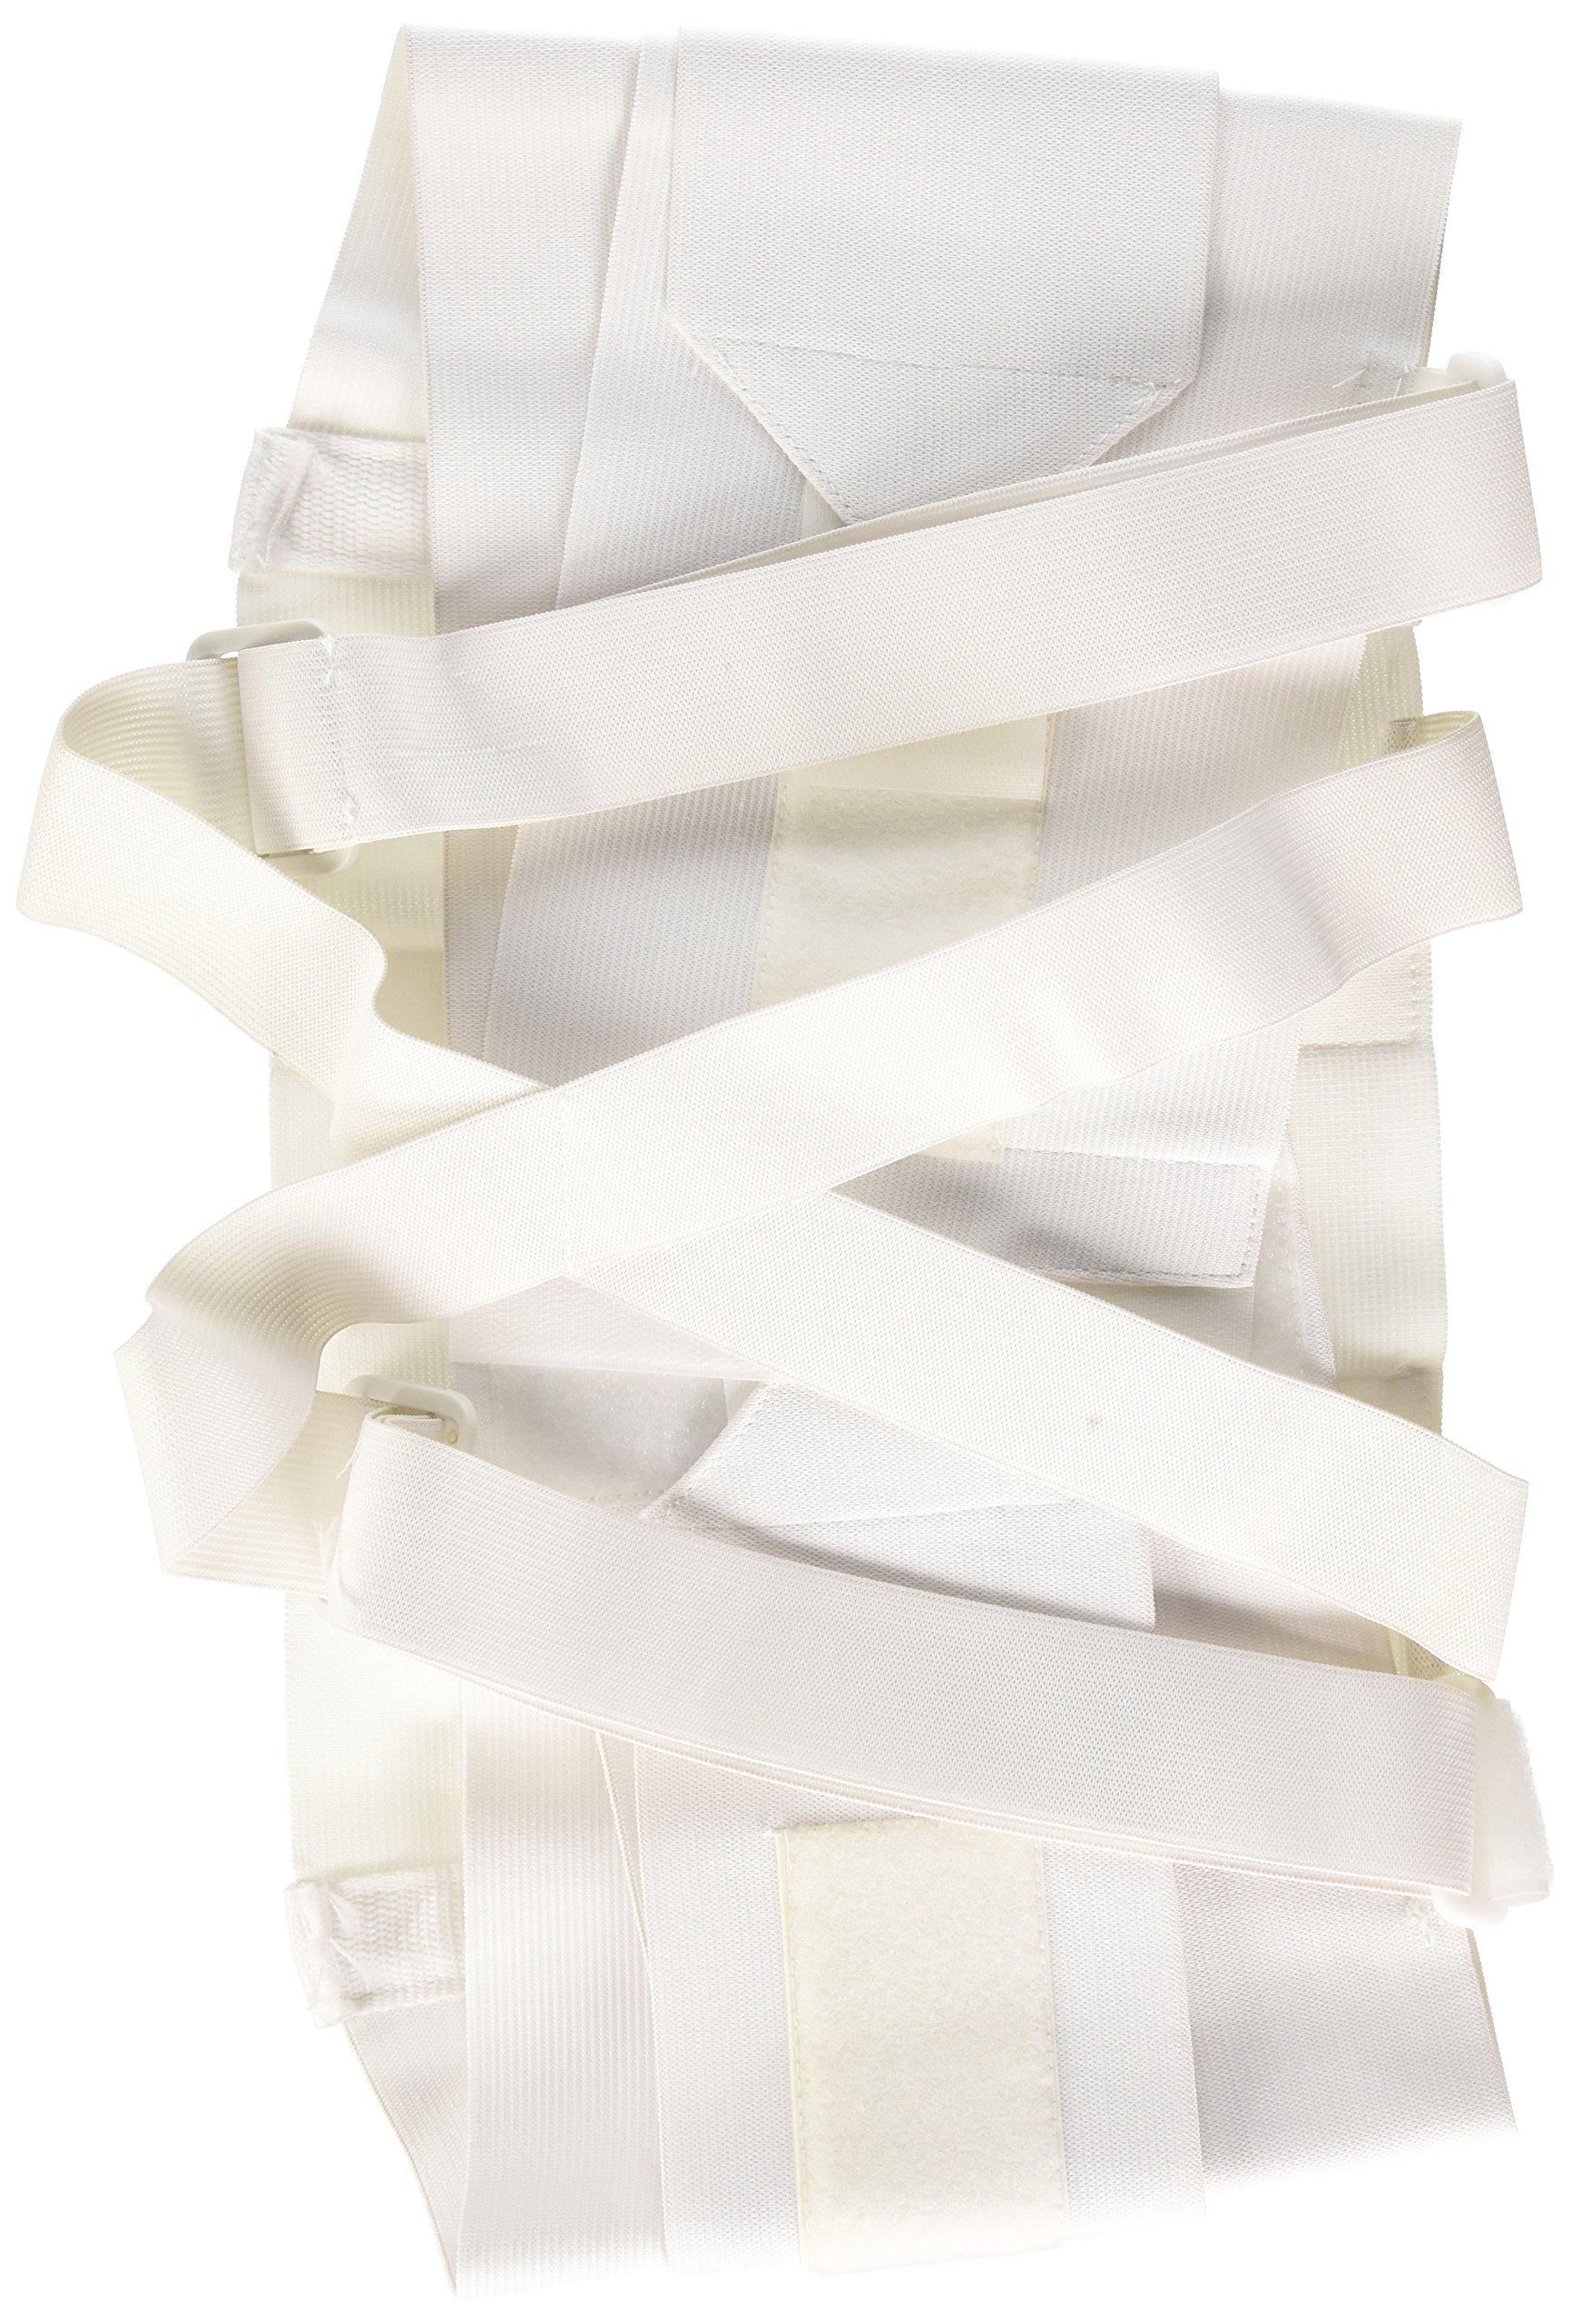 Bilt-Rite Mastex Health 9 Inch Occu-Rite Industrial Support, White, Medium